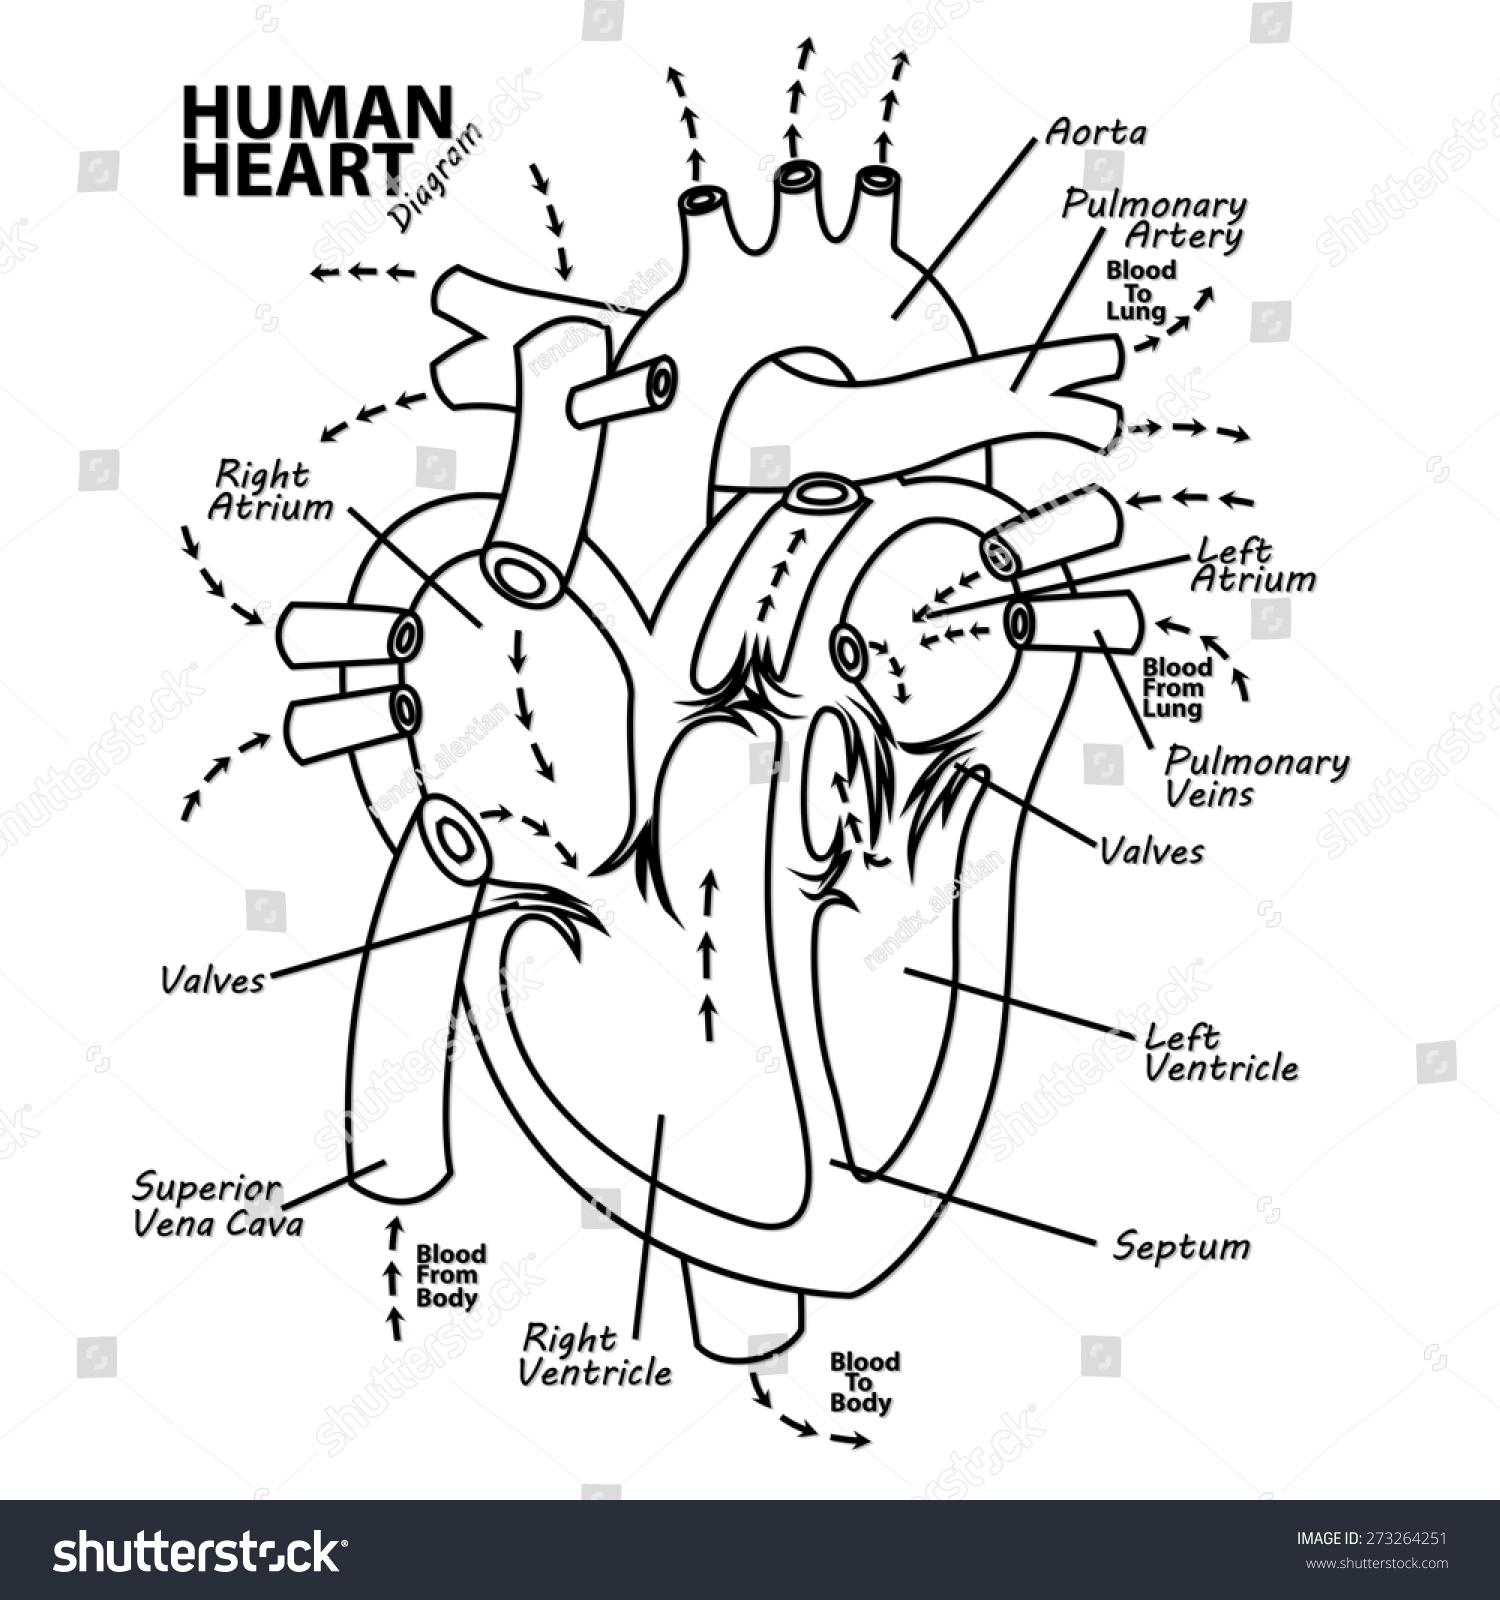 Human Heart Diagram Anatomy Stock Illustration 273264251 Shutterstock